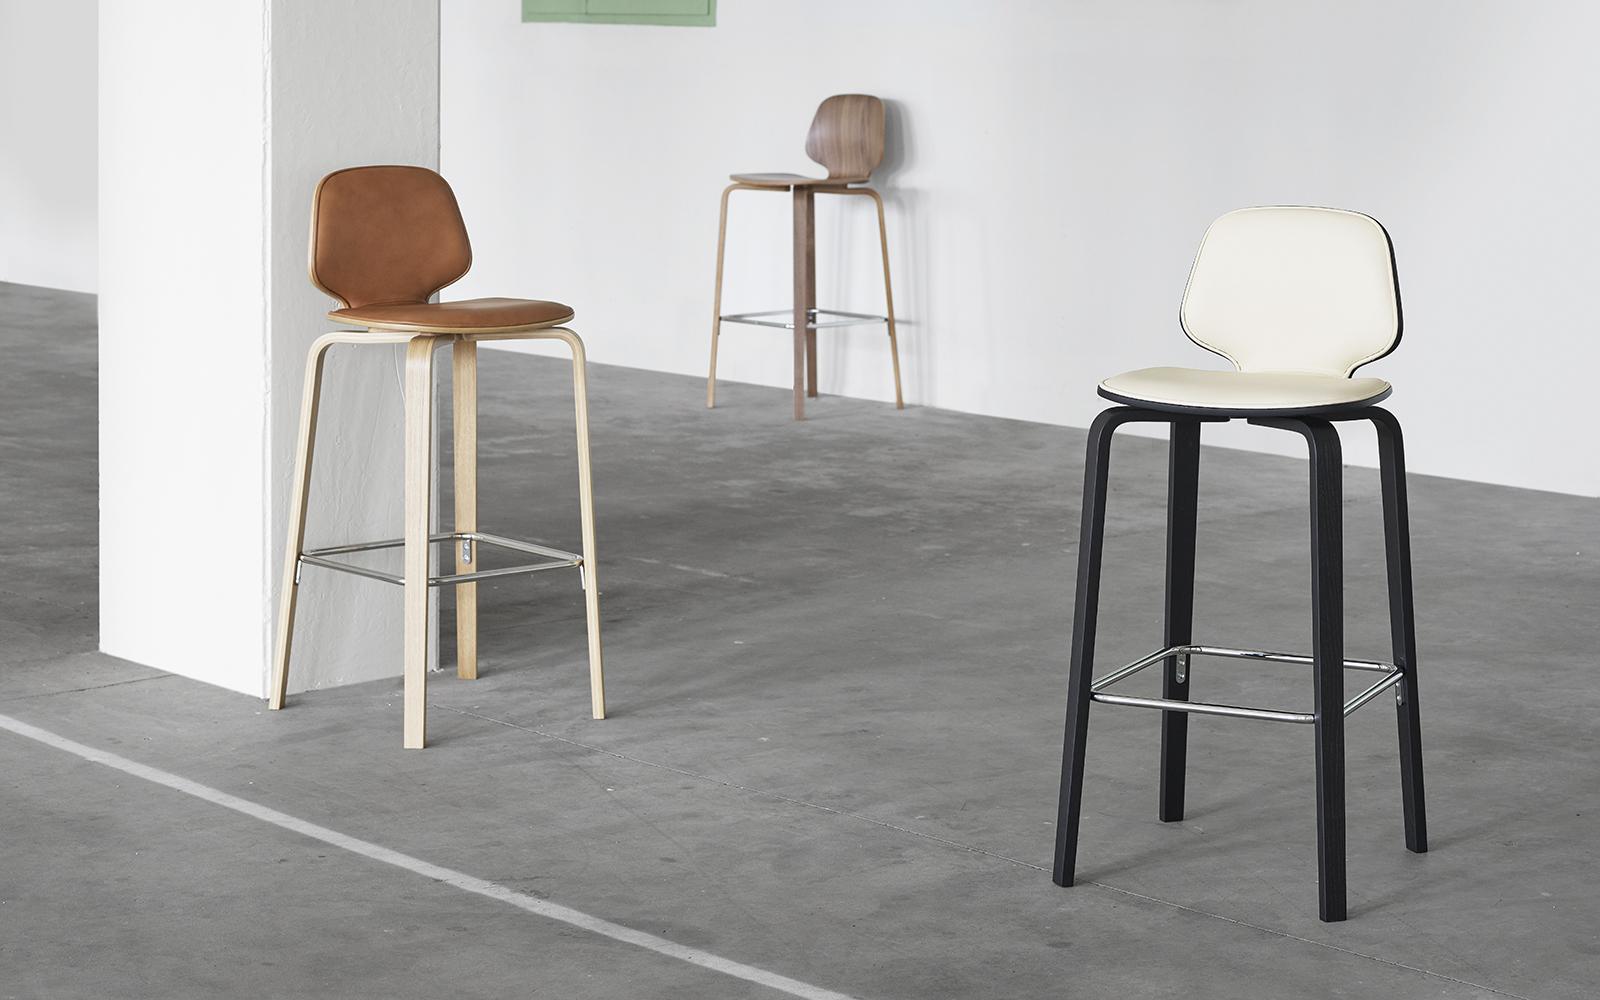 Awe Inspiring My Chair Barstool 75 Cm Walnut Camellatalisay Diy Chair Ideas Camellatalisaycom